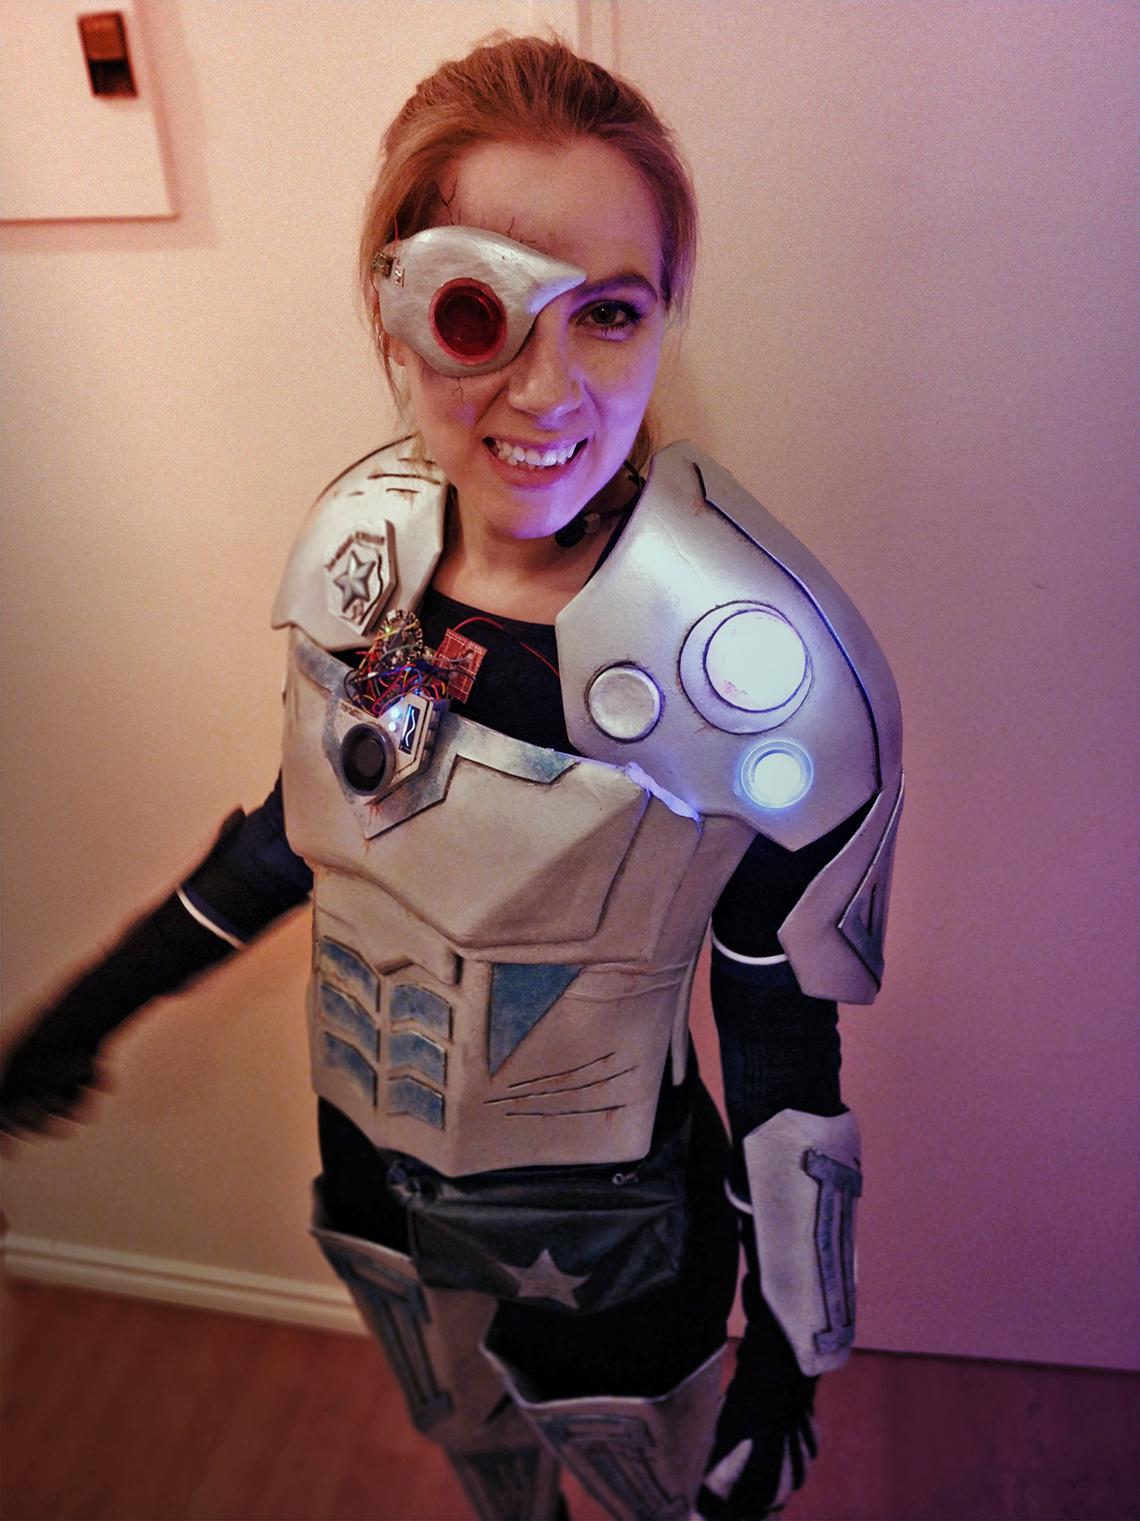 Cyborg police officer costume